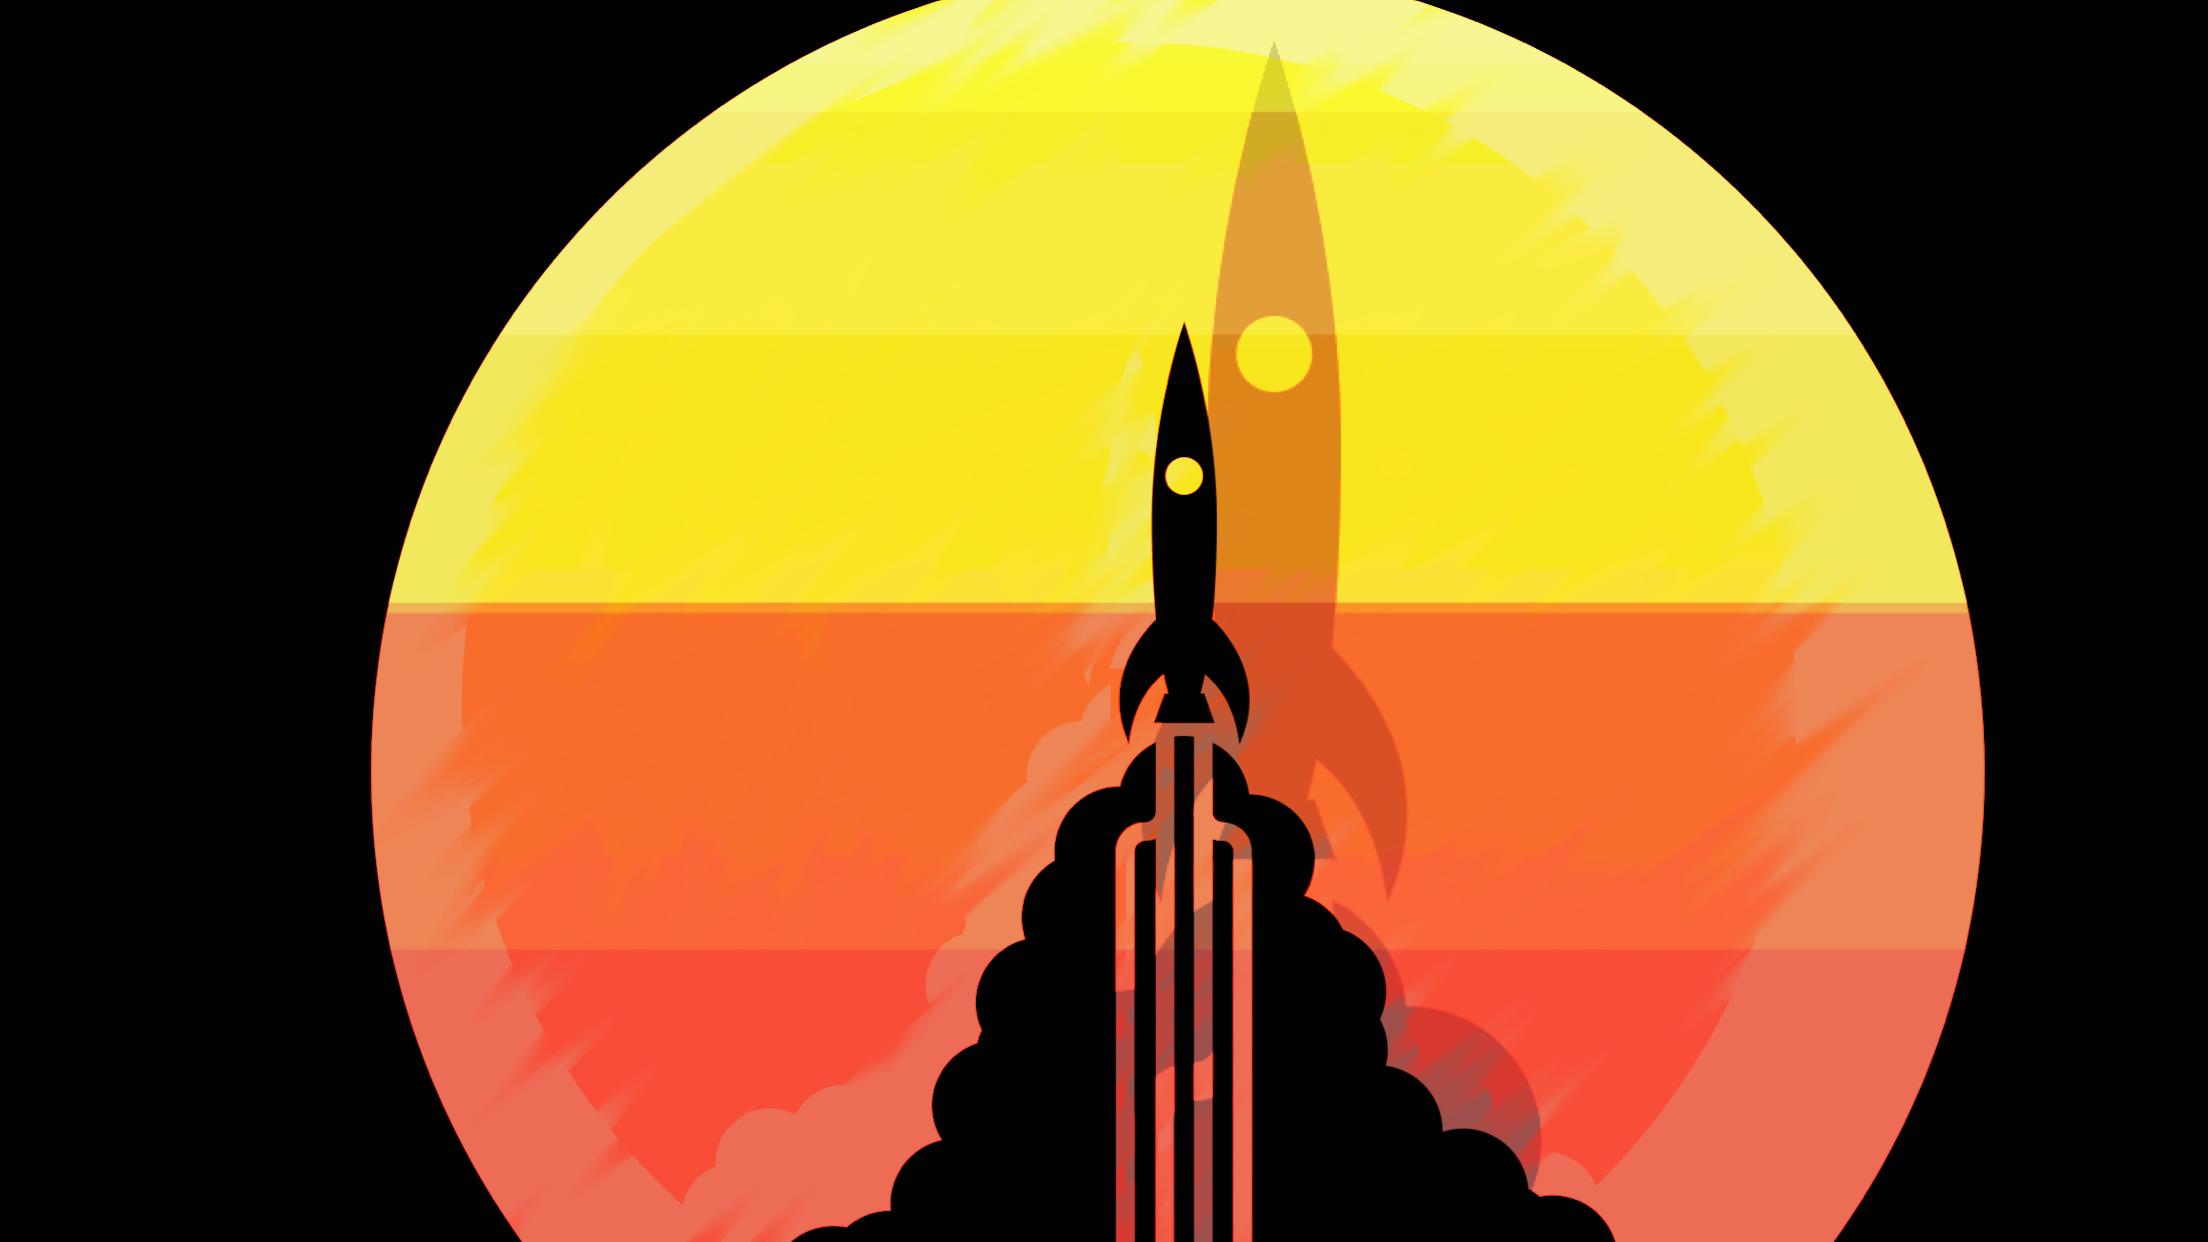 2208x1242 Wallpaper Illustration, Silhouette, Sun Rays, Spaceship, Rocket